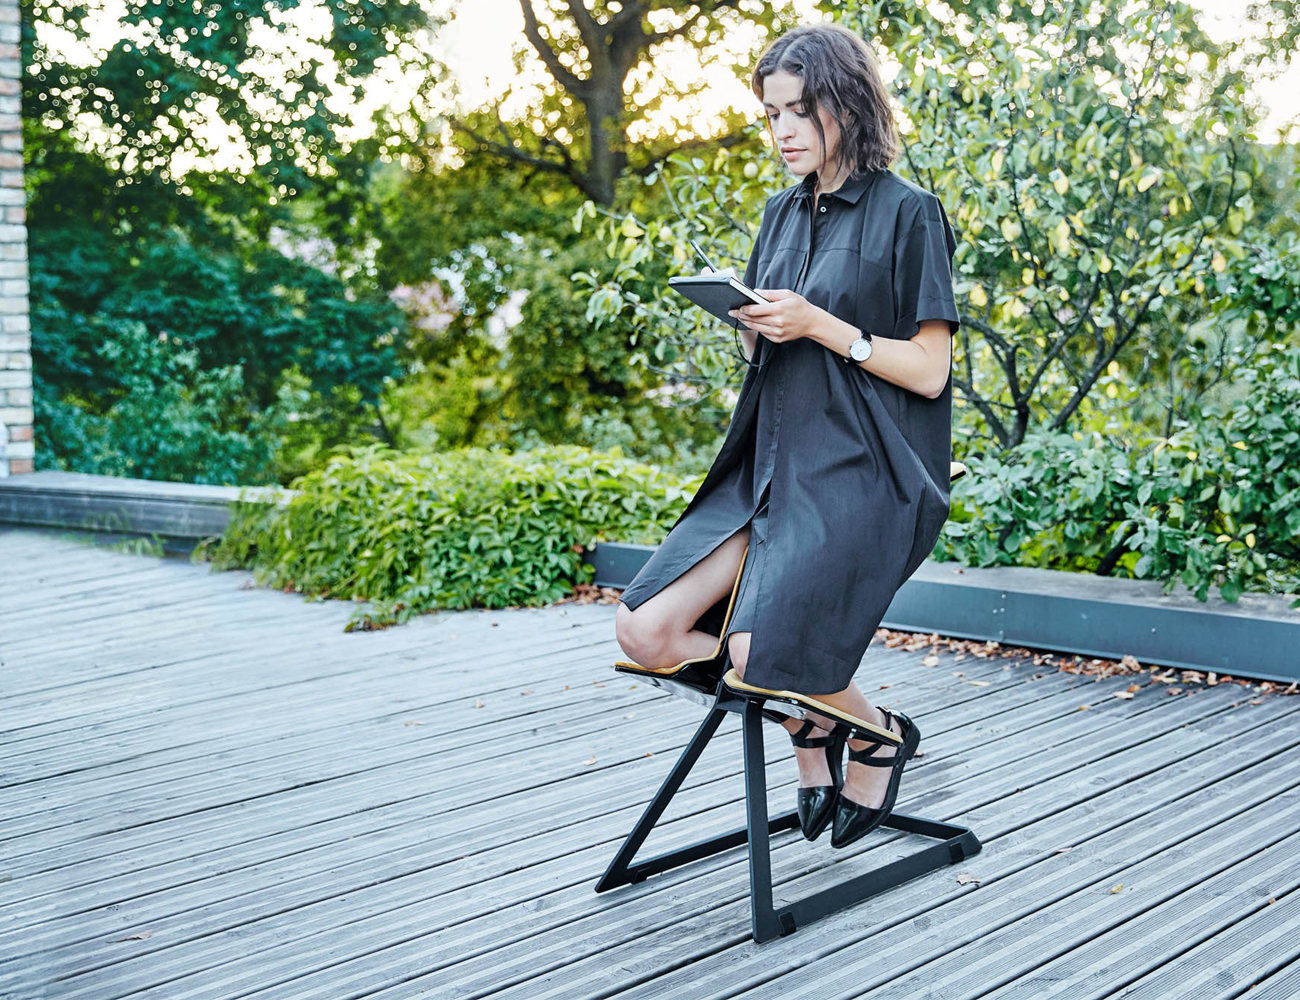 W Chair – the Truly Ergonomic Desk Chair